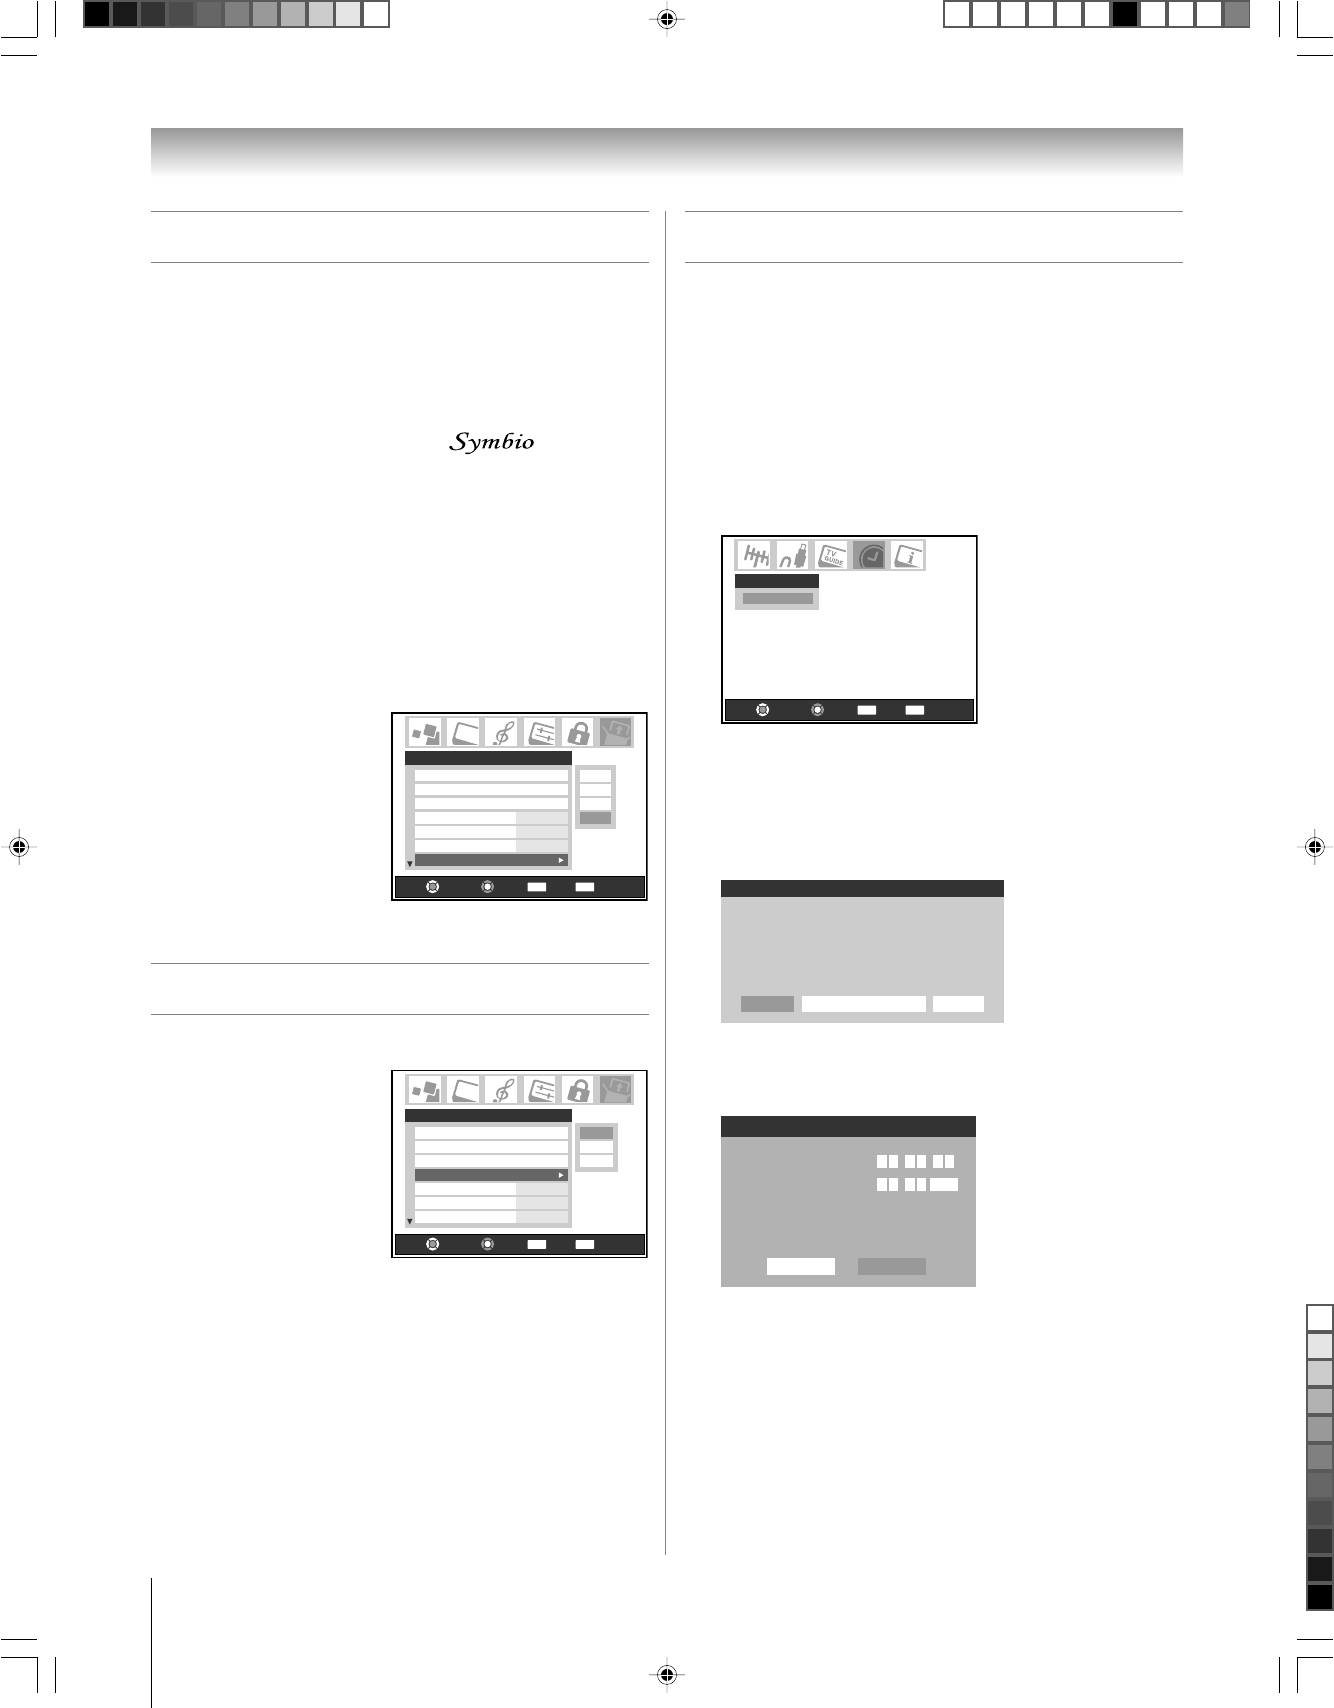 Toshiba Dlp 52Hm95 Users Manual